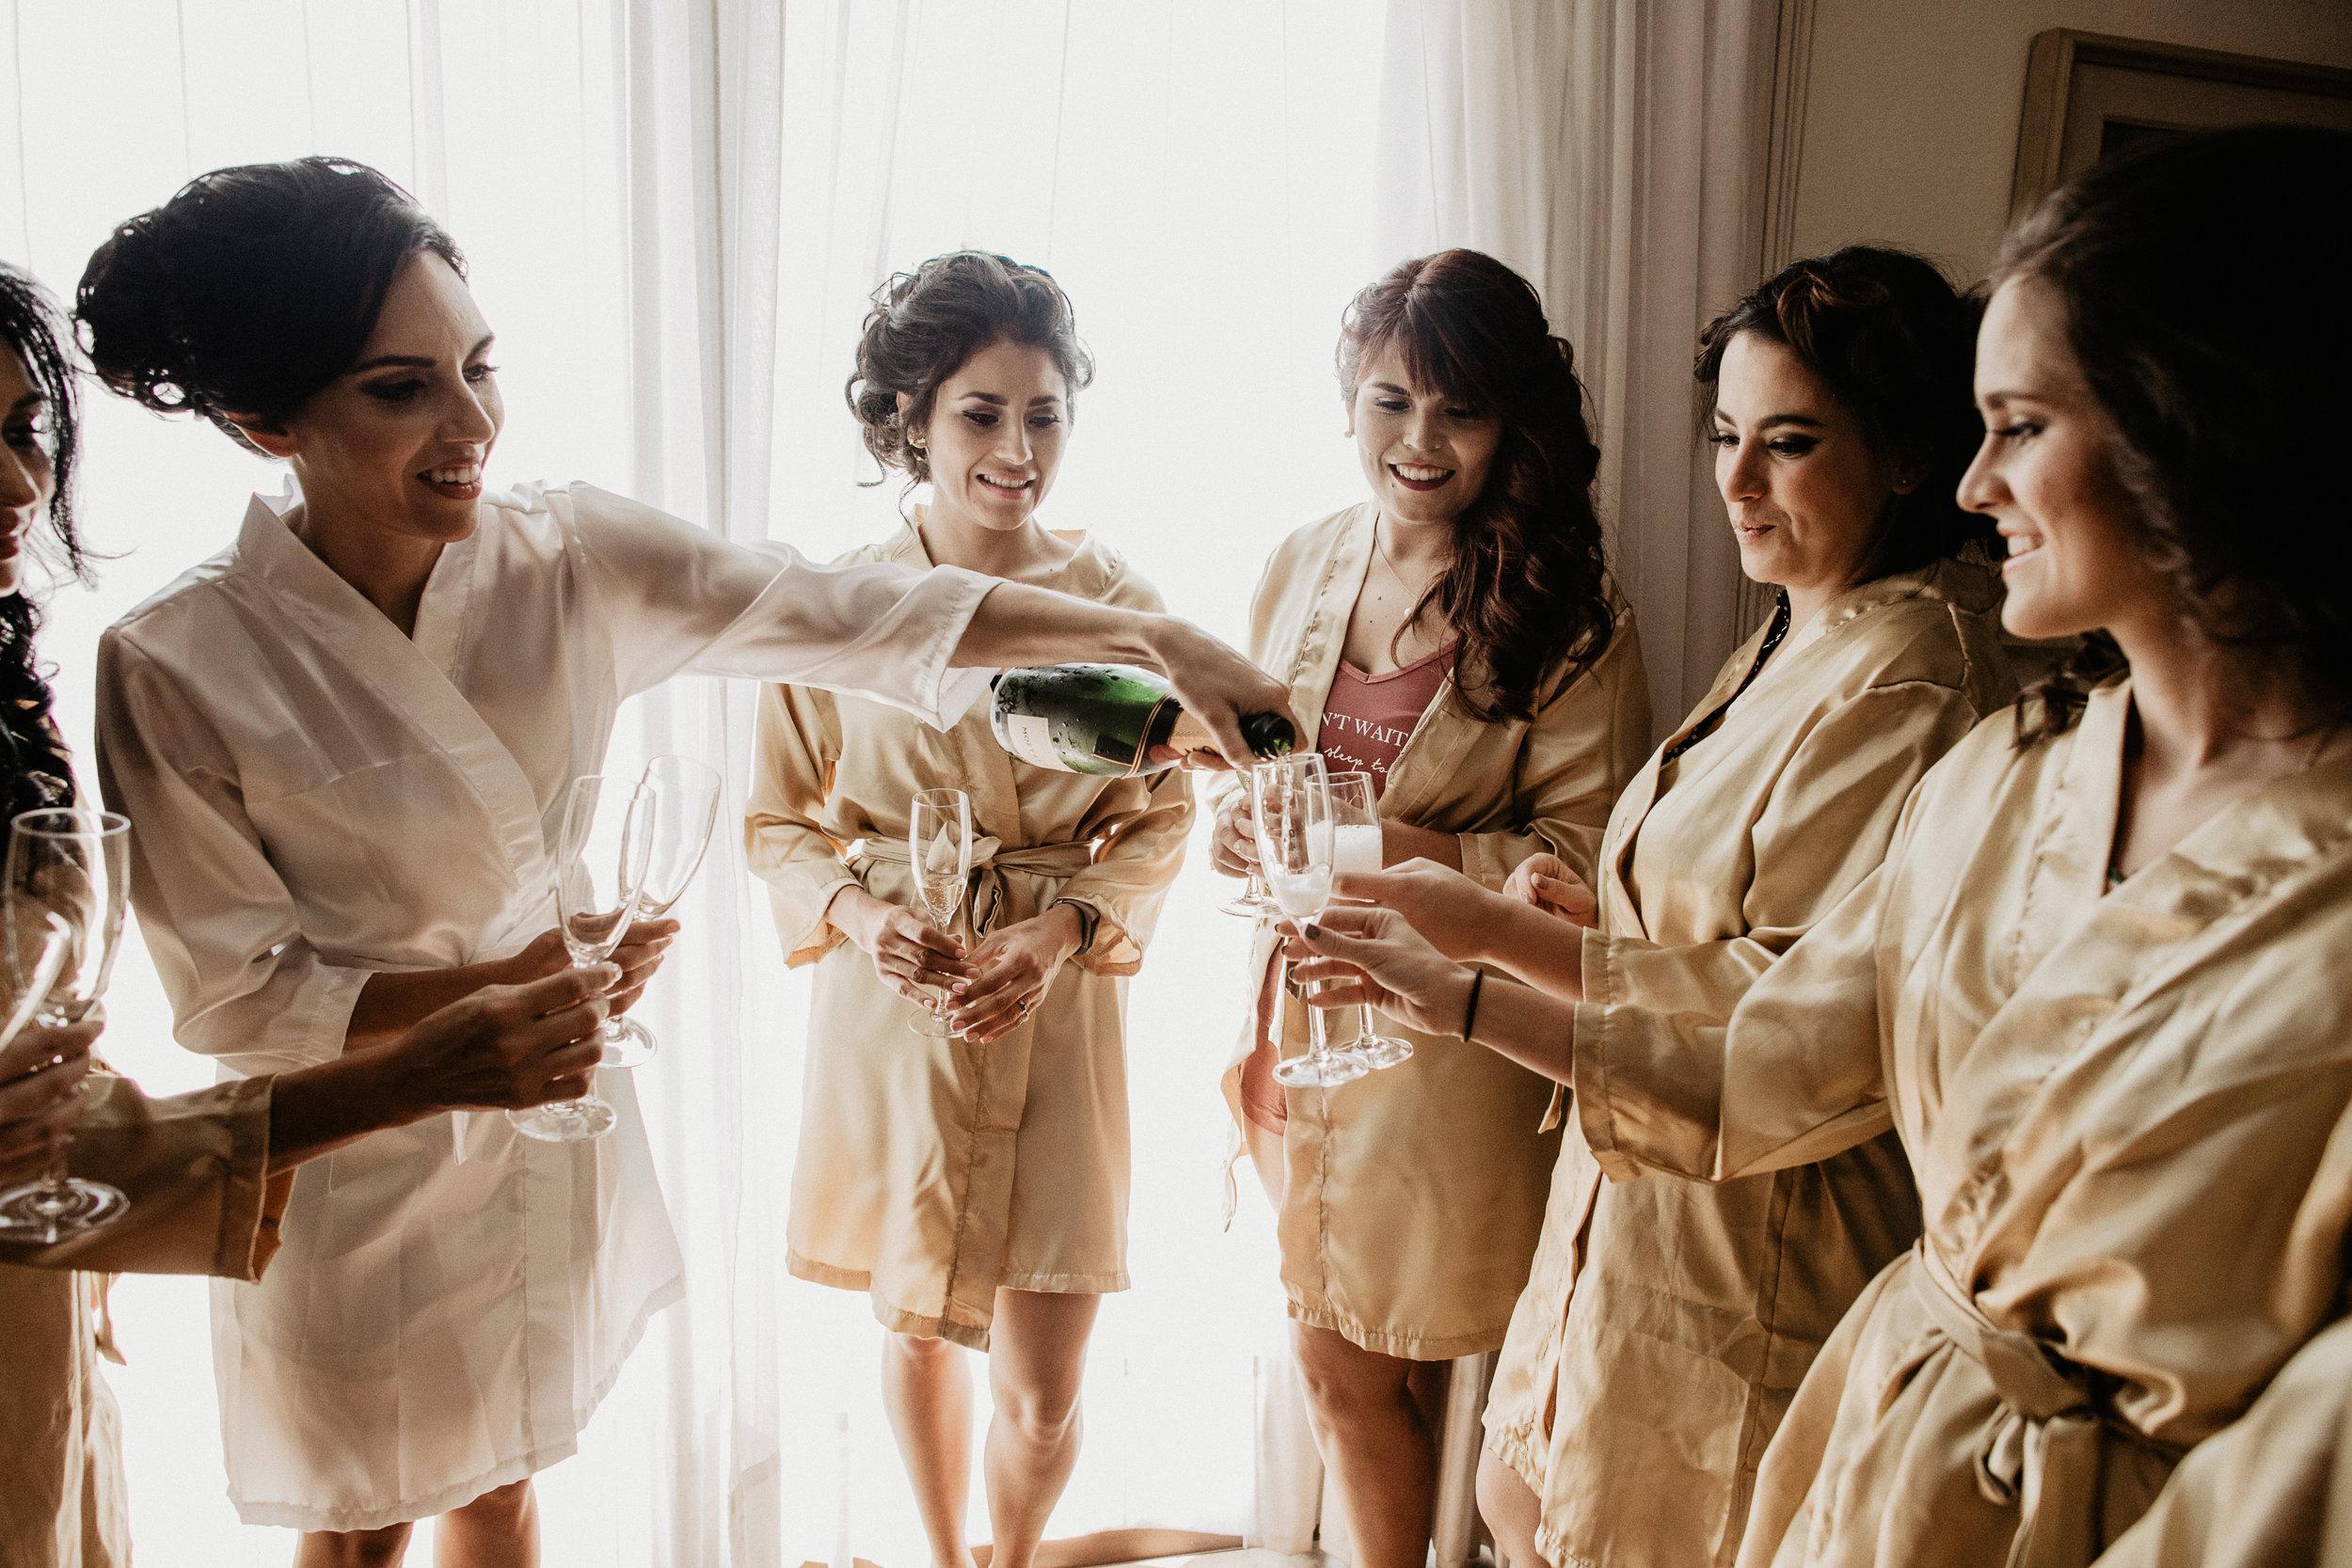 Alfonso_flores_destination_wedding_photography_vanesa_carlos-90.JPG